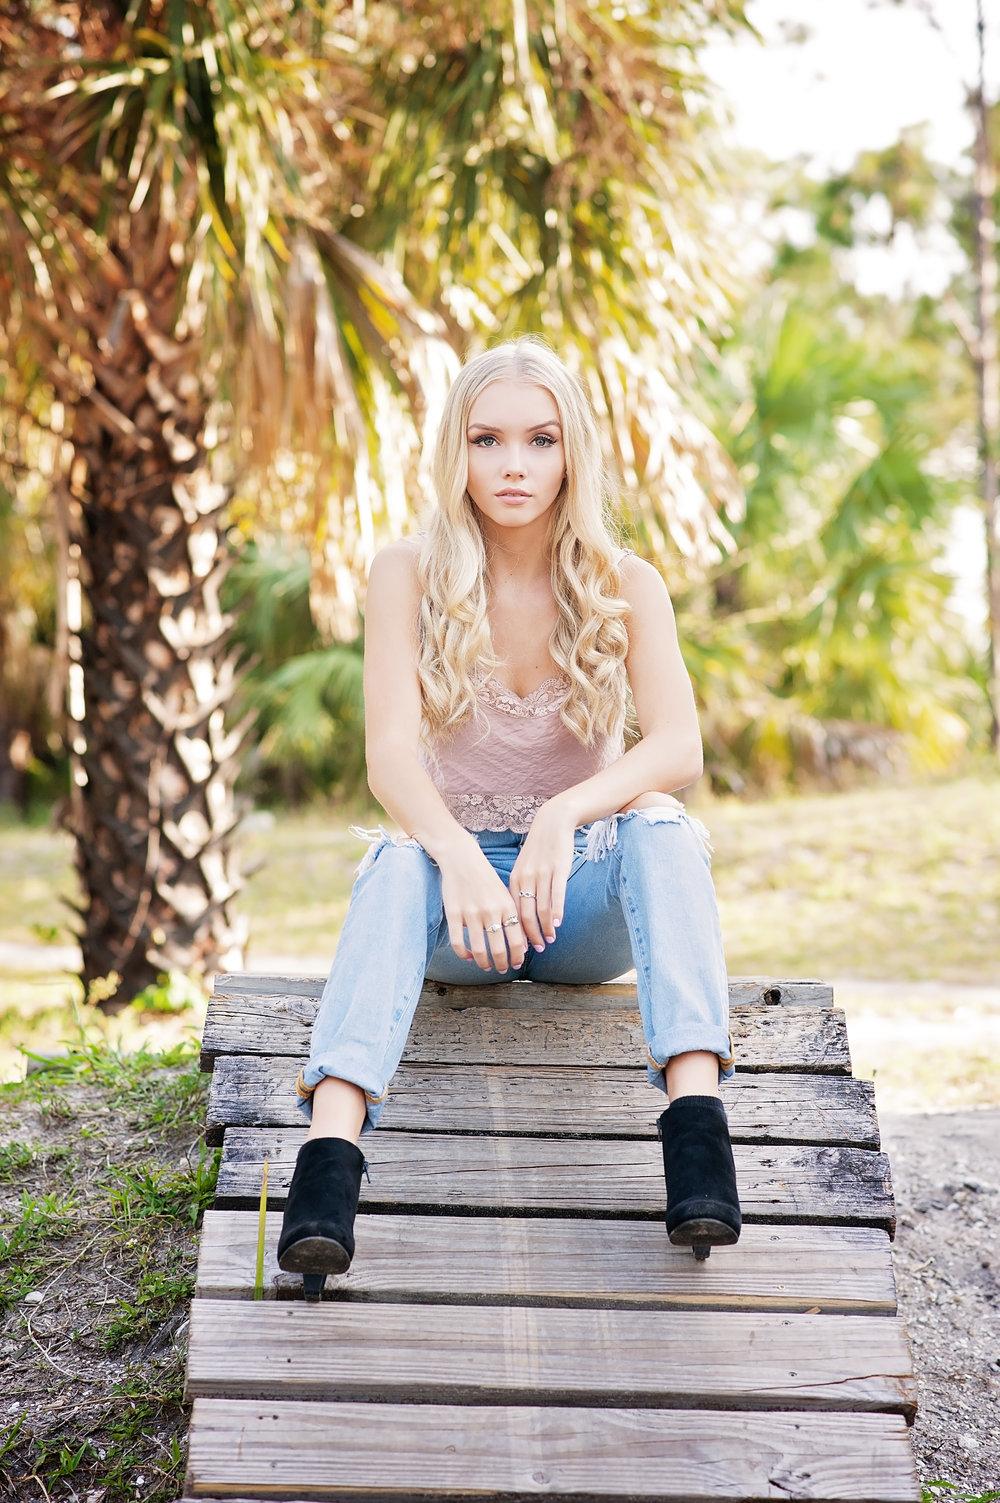 South Florida-photography-professional photographer-photography website-local photographer-teens-high school senior-photos-portrait photographer-78.jpg